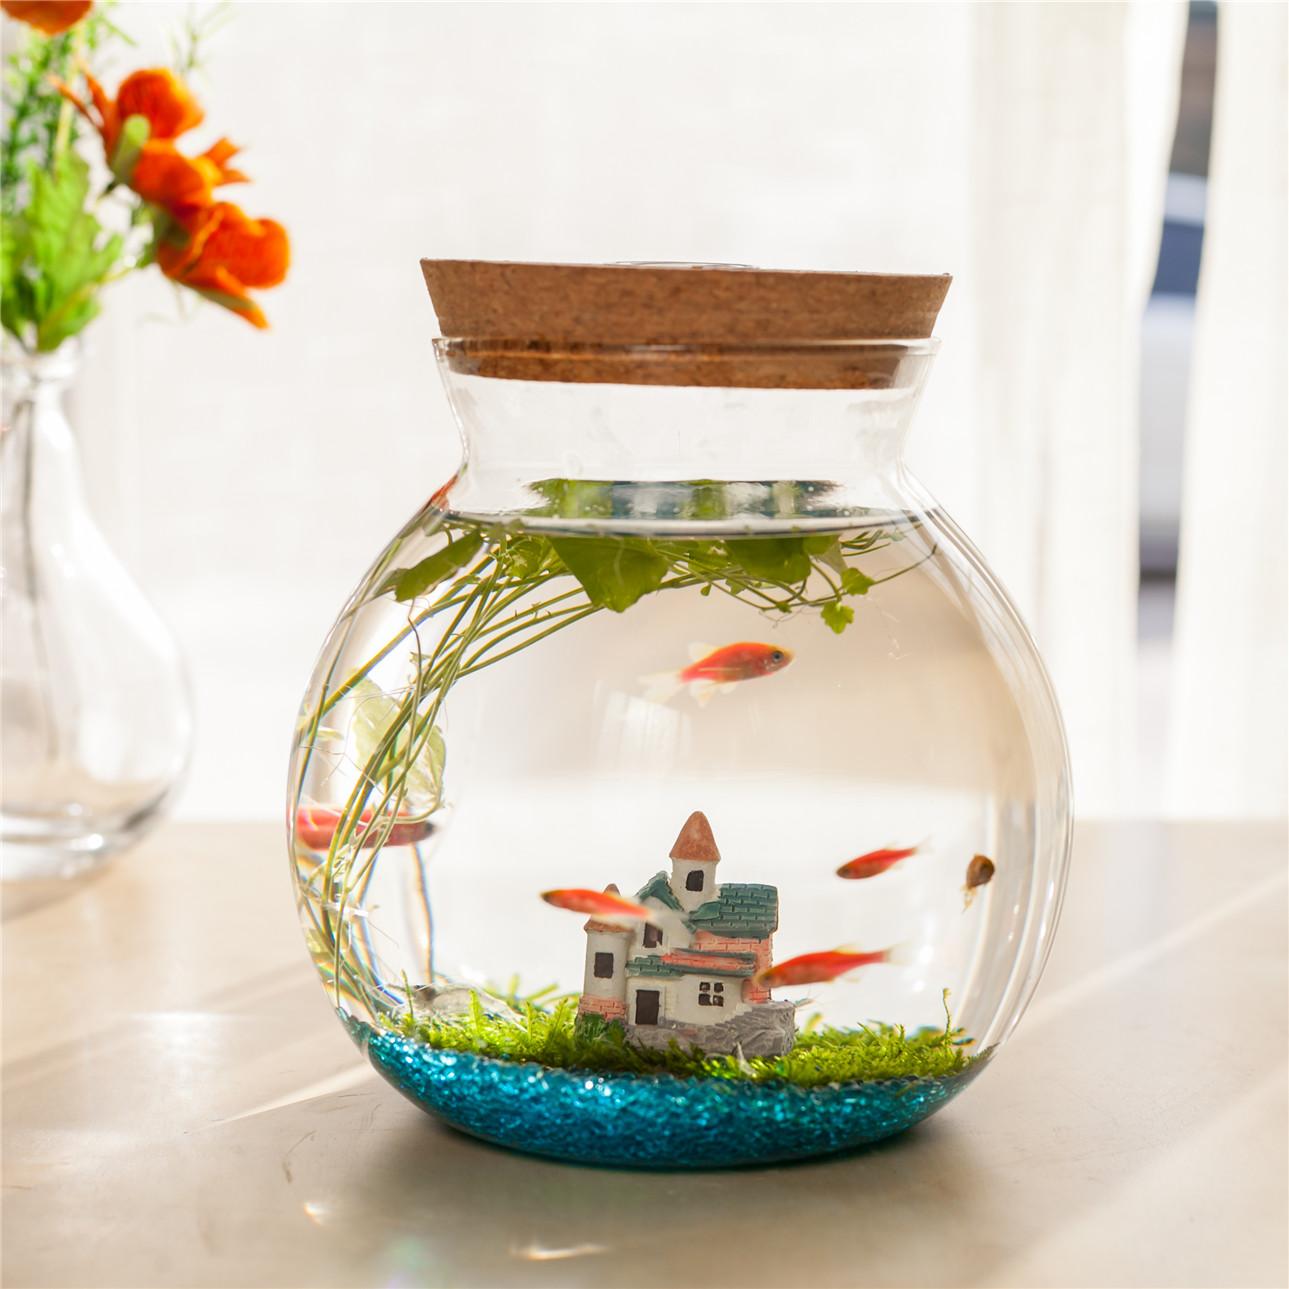 Креативные аквариумы Артикул 537387595470